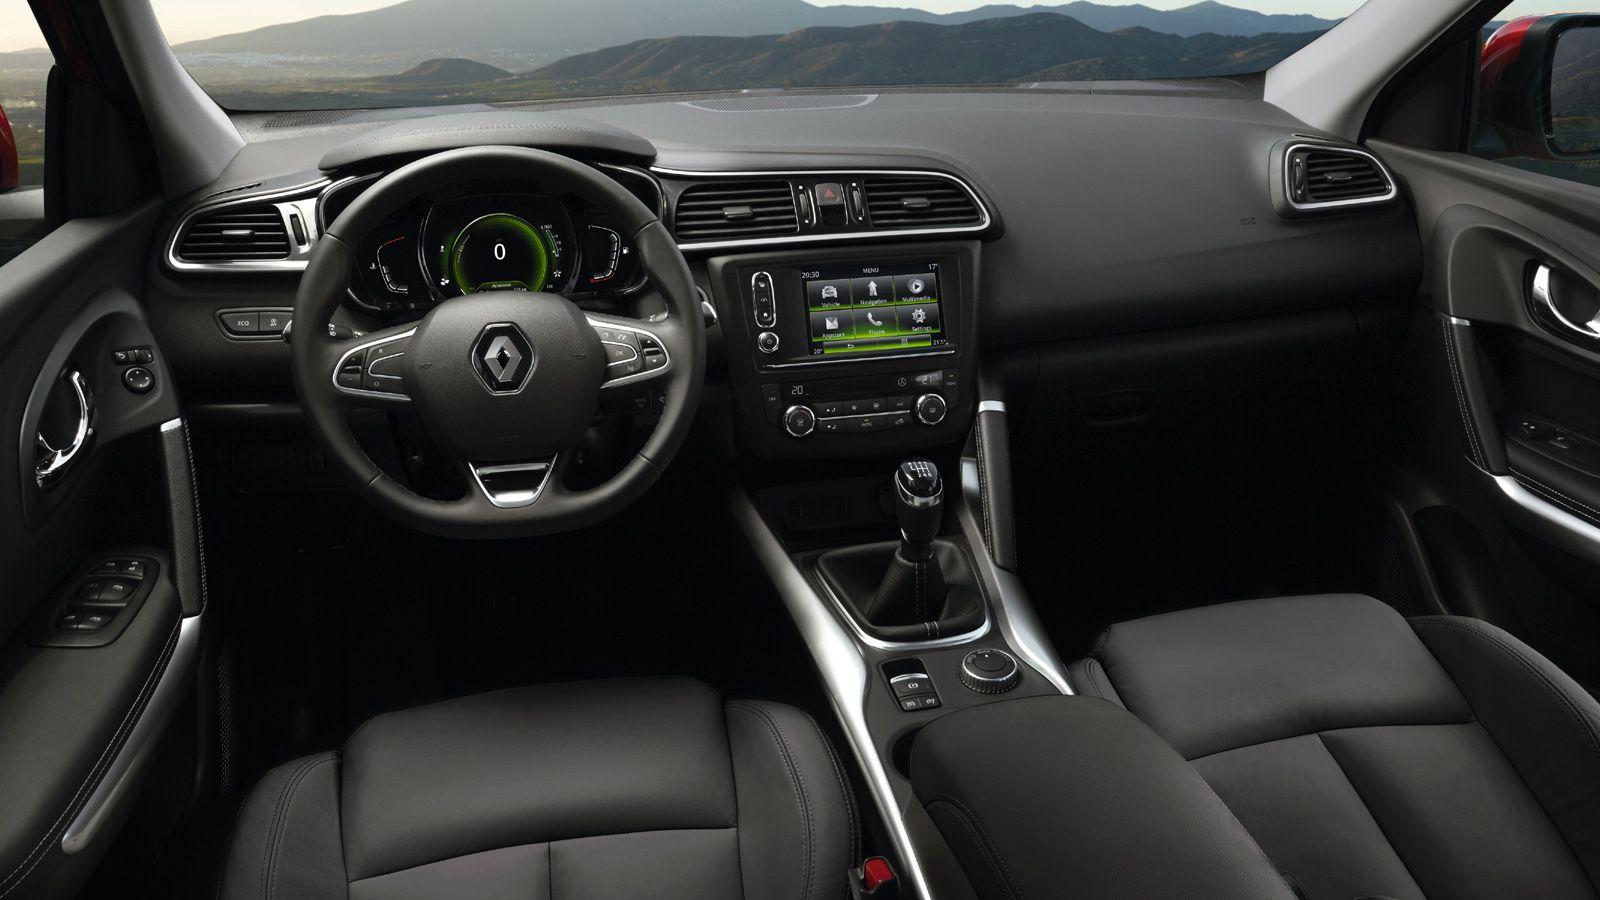 Renault%2BKadjar interior Σήμερα στην αυτοκίνηση ο Cambiasso θα δει από κοντά το νέο Renault Kadjar